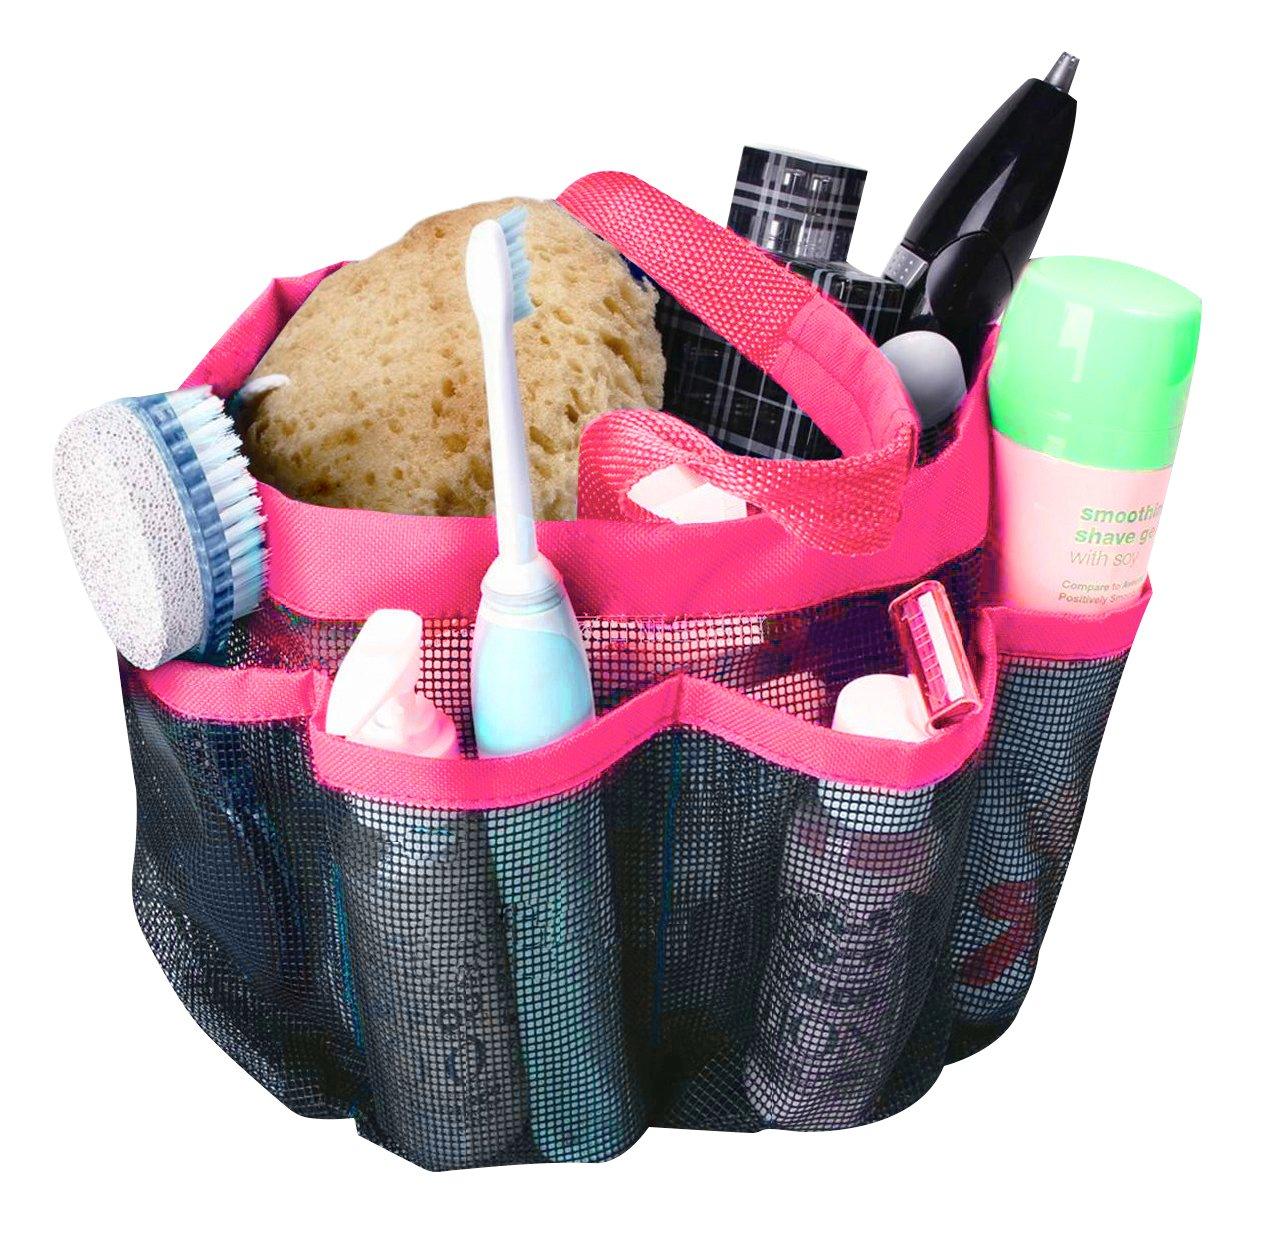 Attmu Oxford Mesh Shower Caddy, Shower Tote, Shower Bag, Bathrooms Bag, Black SC-002